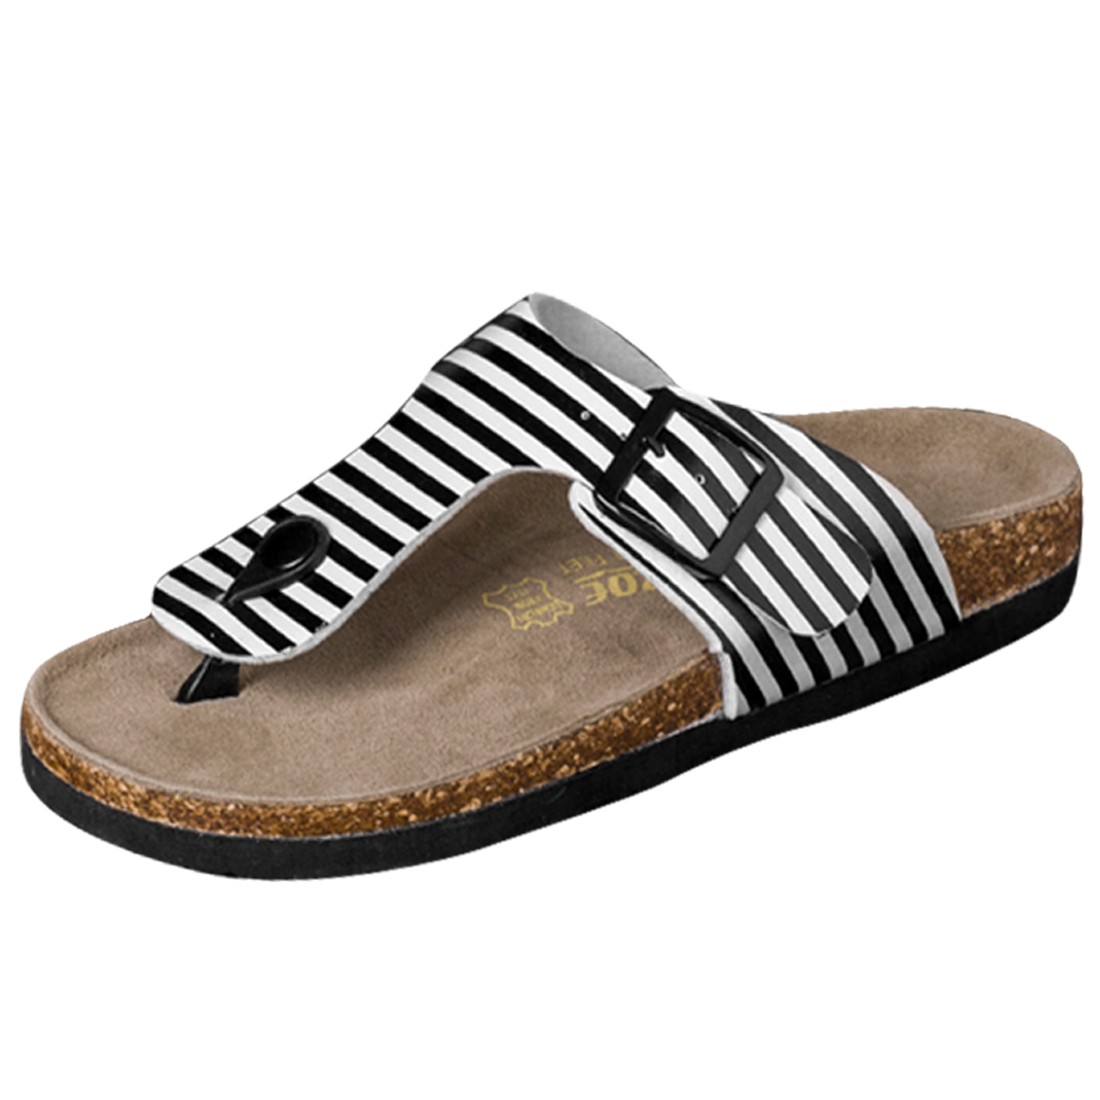 Men Adjustable Strap Stripes Print Sandal Black White US Size 10